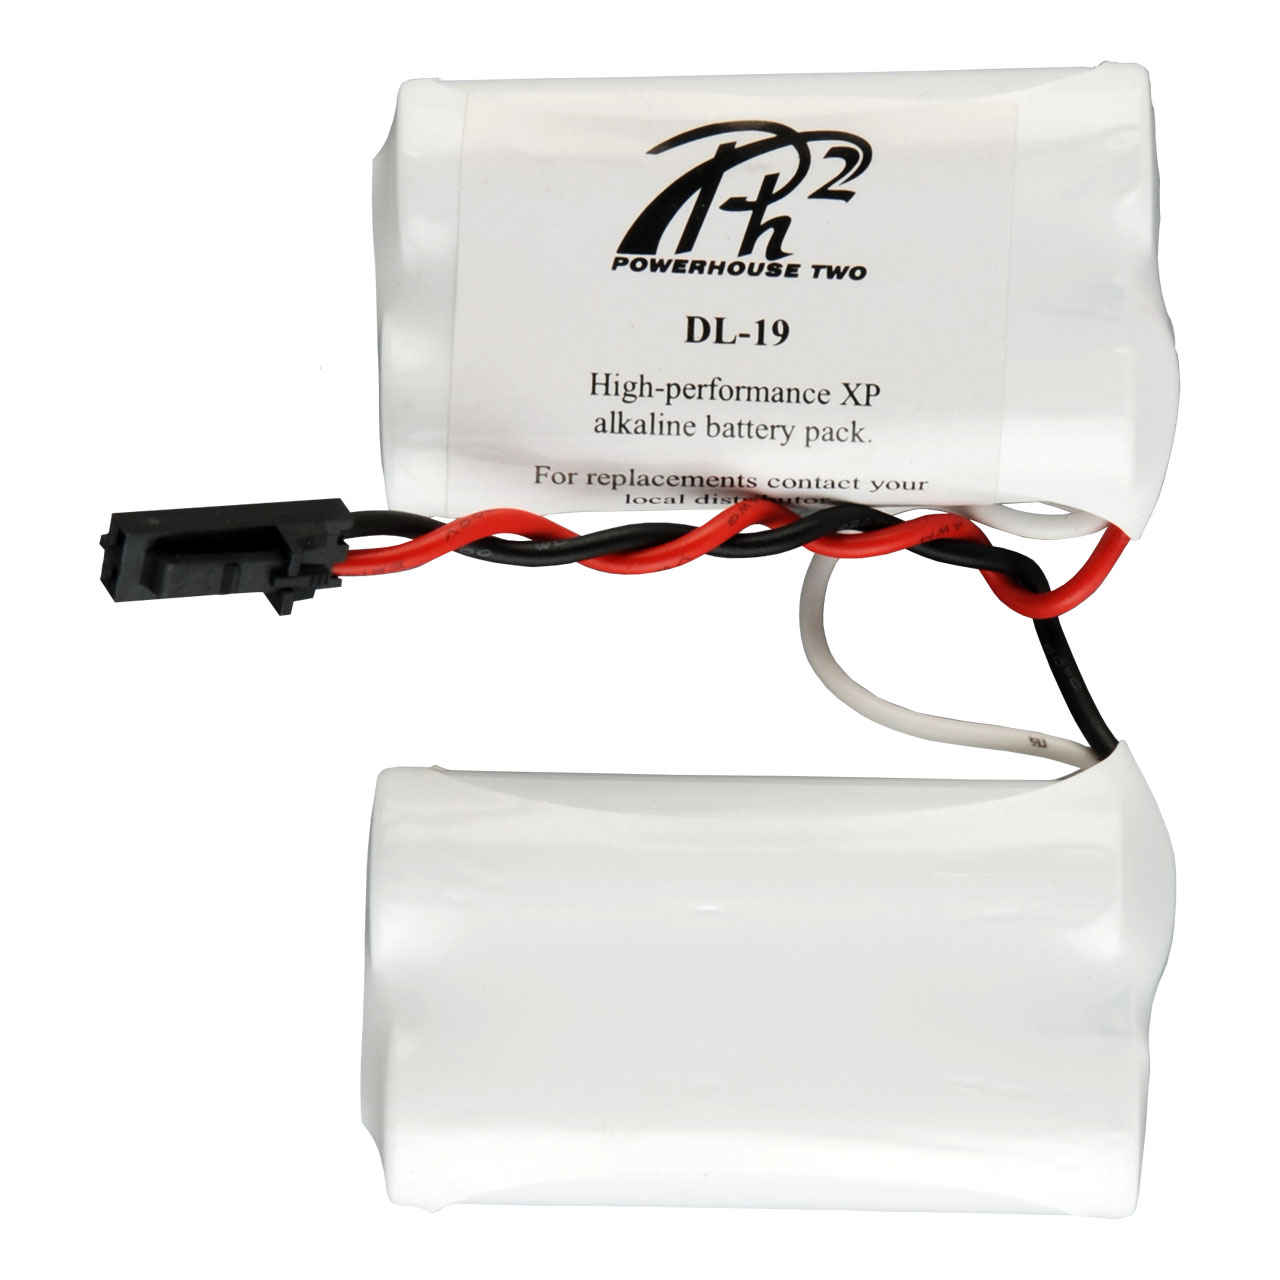 DL-19 Hospitality Battery Pack